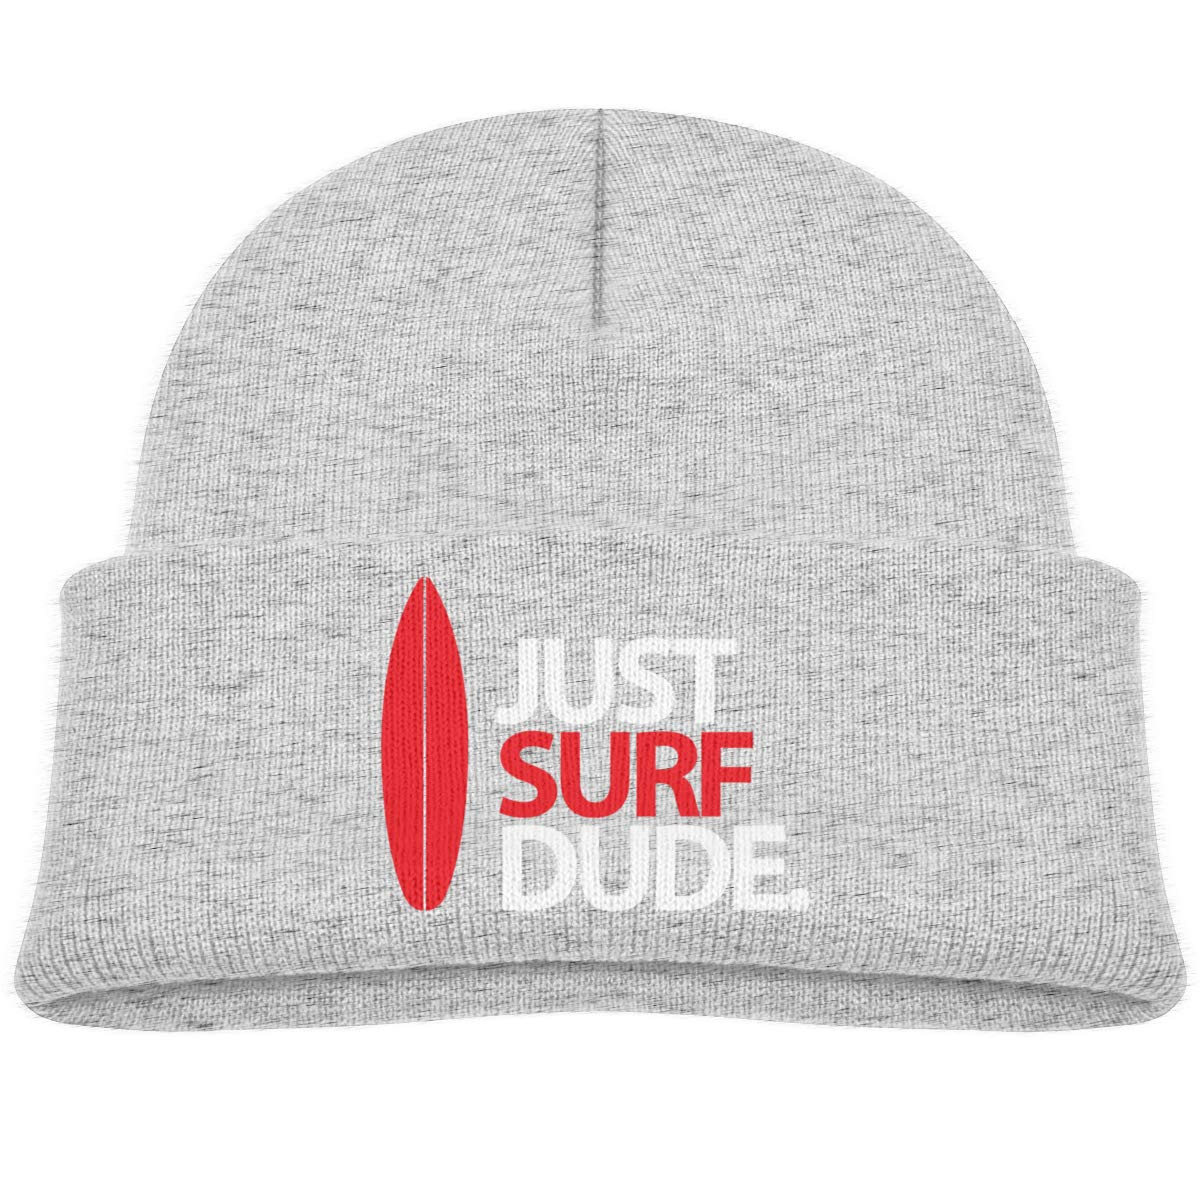 c519cffb958 Just surf dude baby boy skull cap knit hats clothing jpg 1200x1200 Surfer  dude beanie